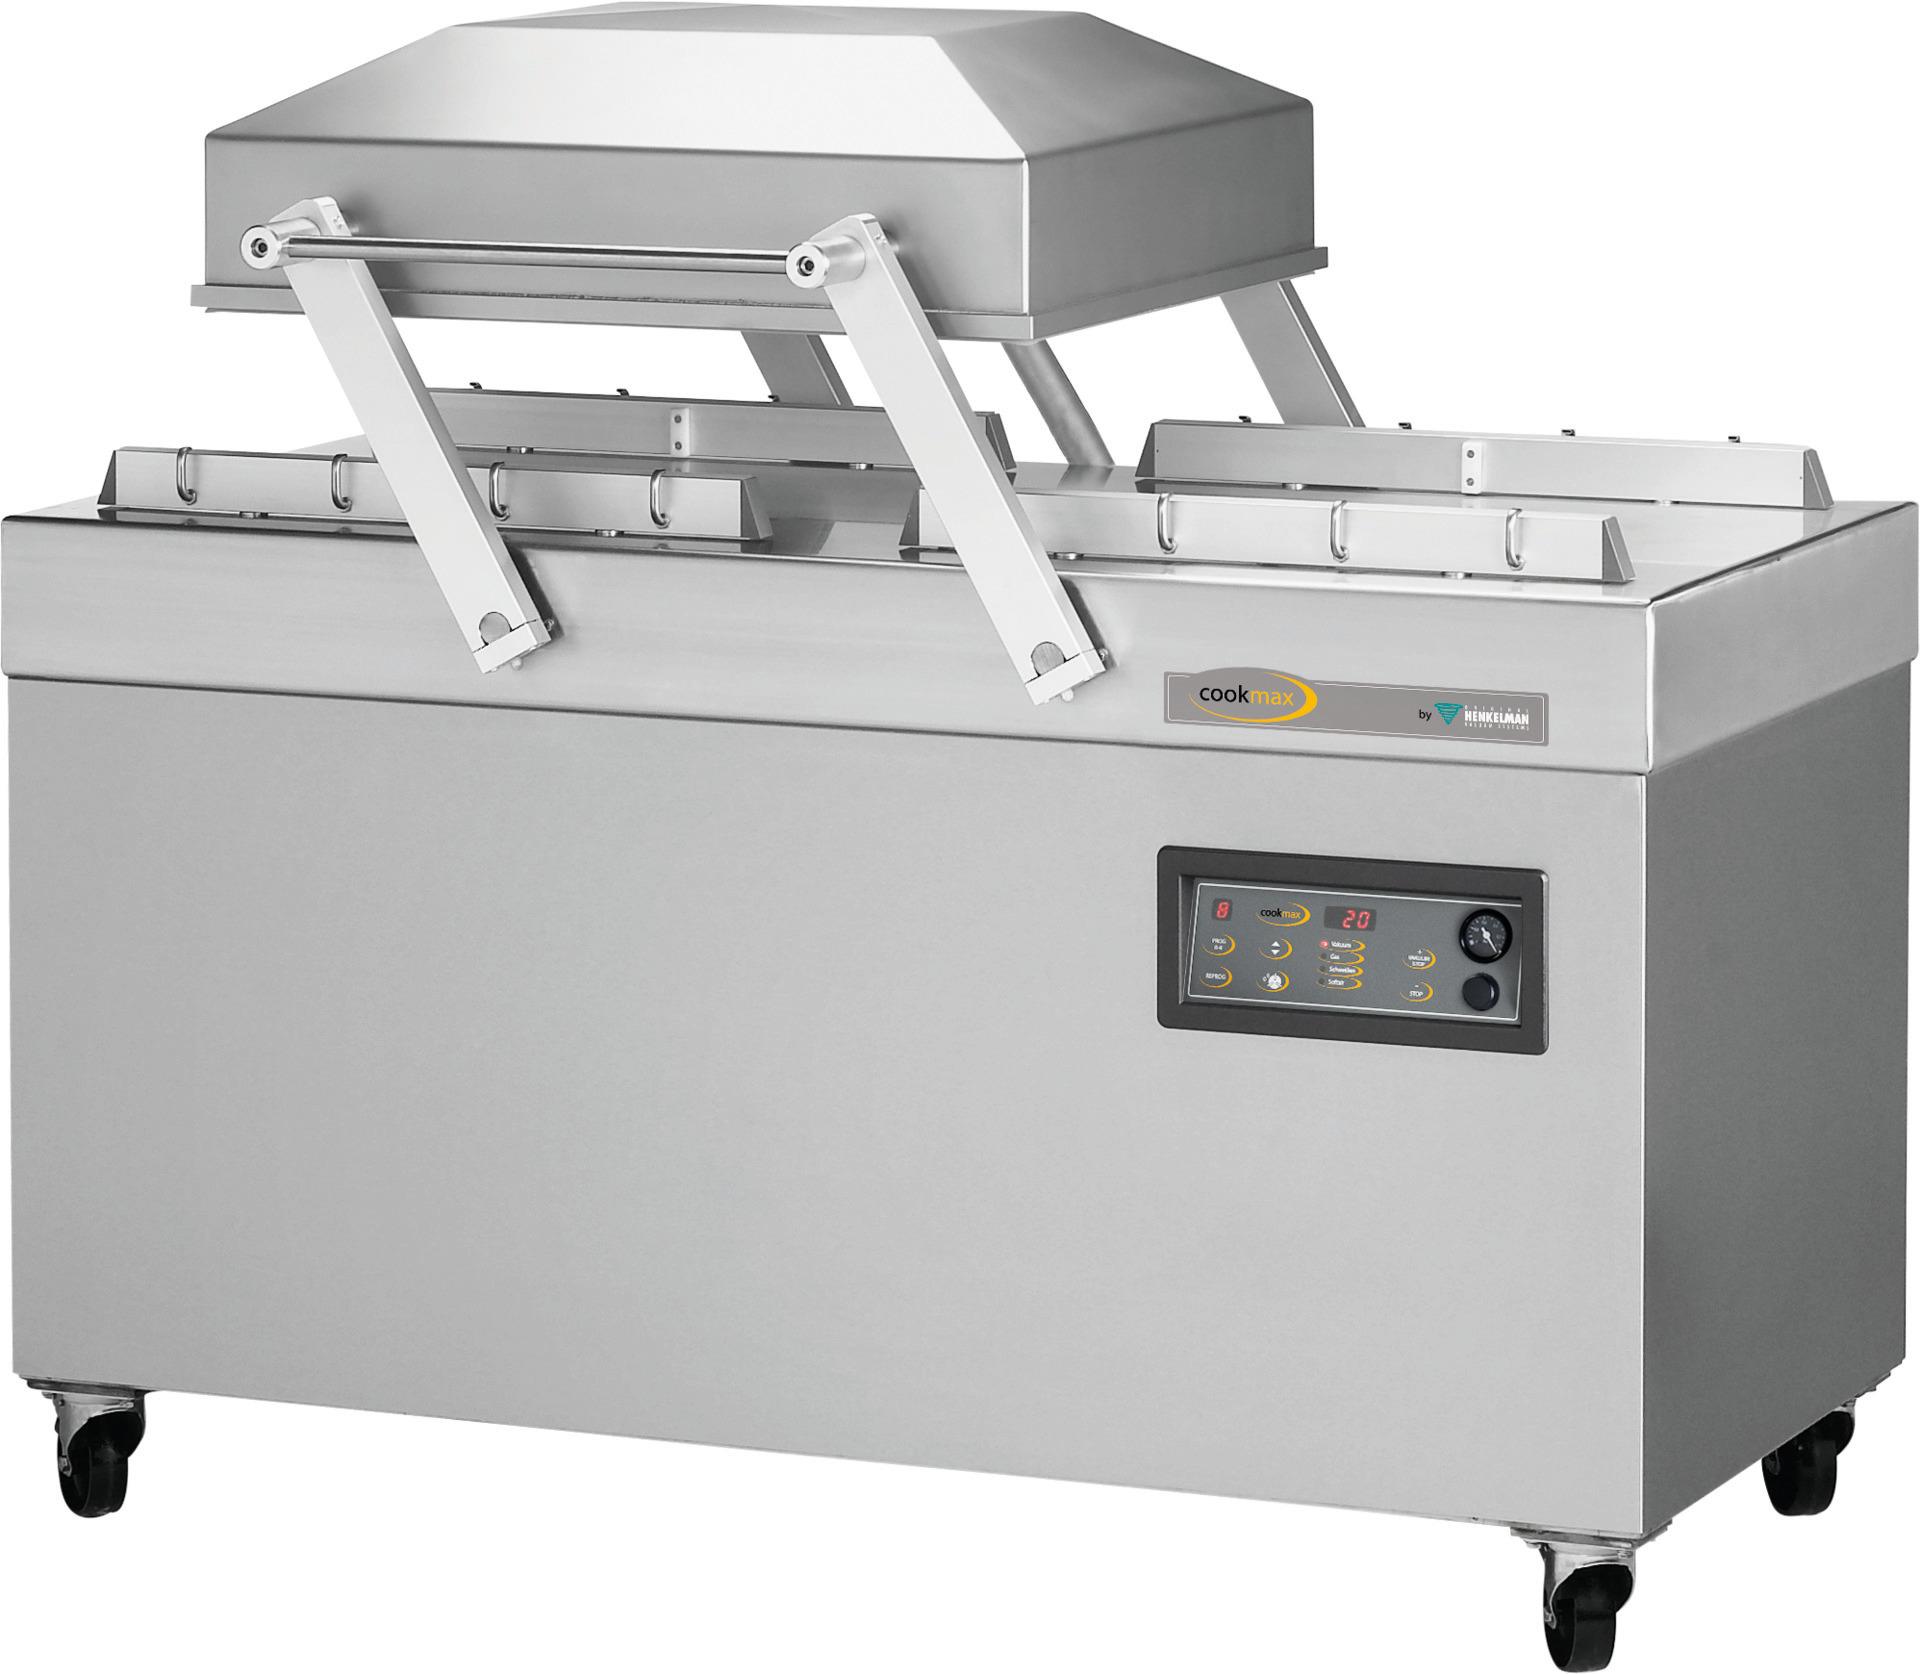 Vakuumierer 100 m³/h / Doppelkammer 620 x 500 x 240 mm